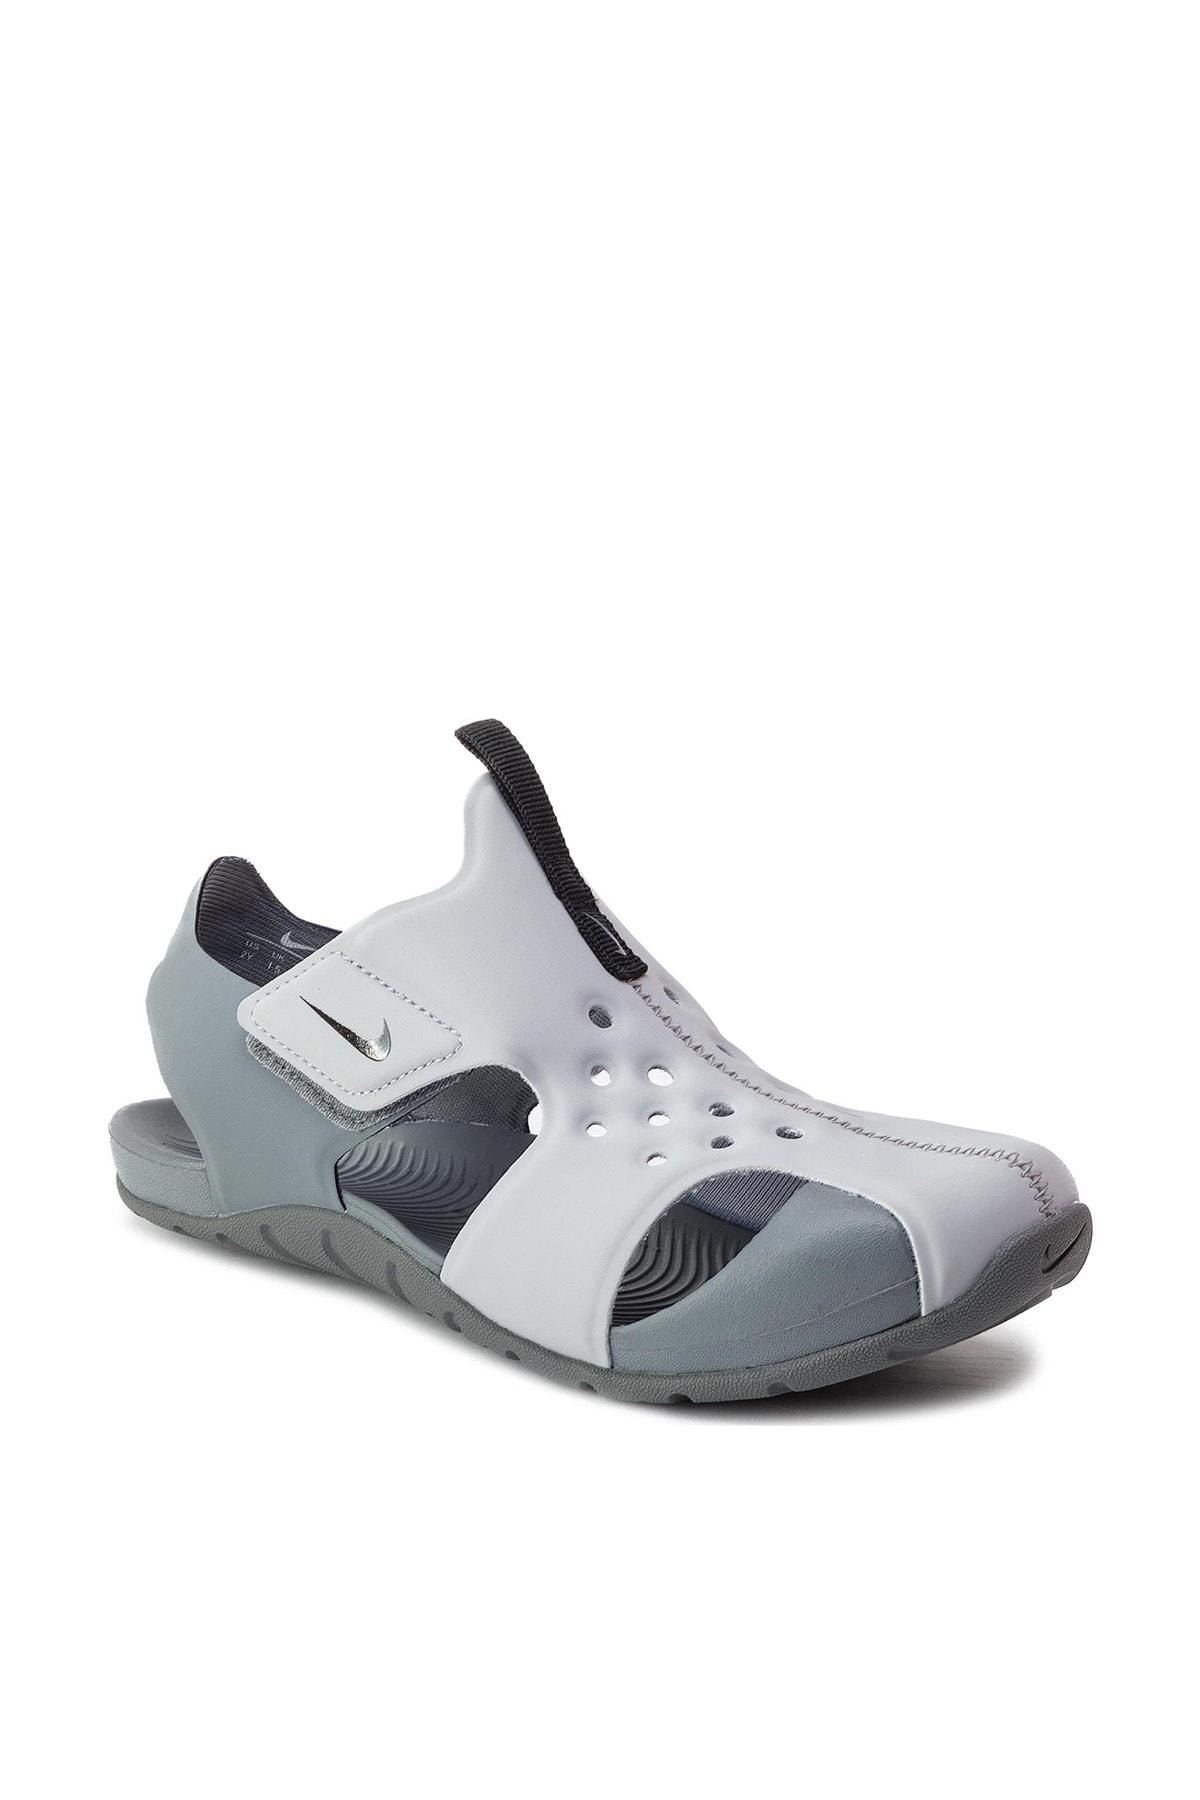 Nike Gri 943826-004 Sunray Protect Çocuk Sandalet